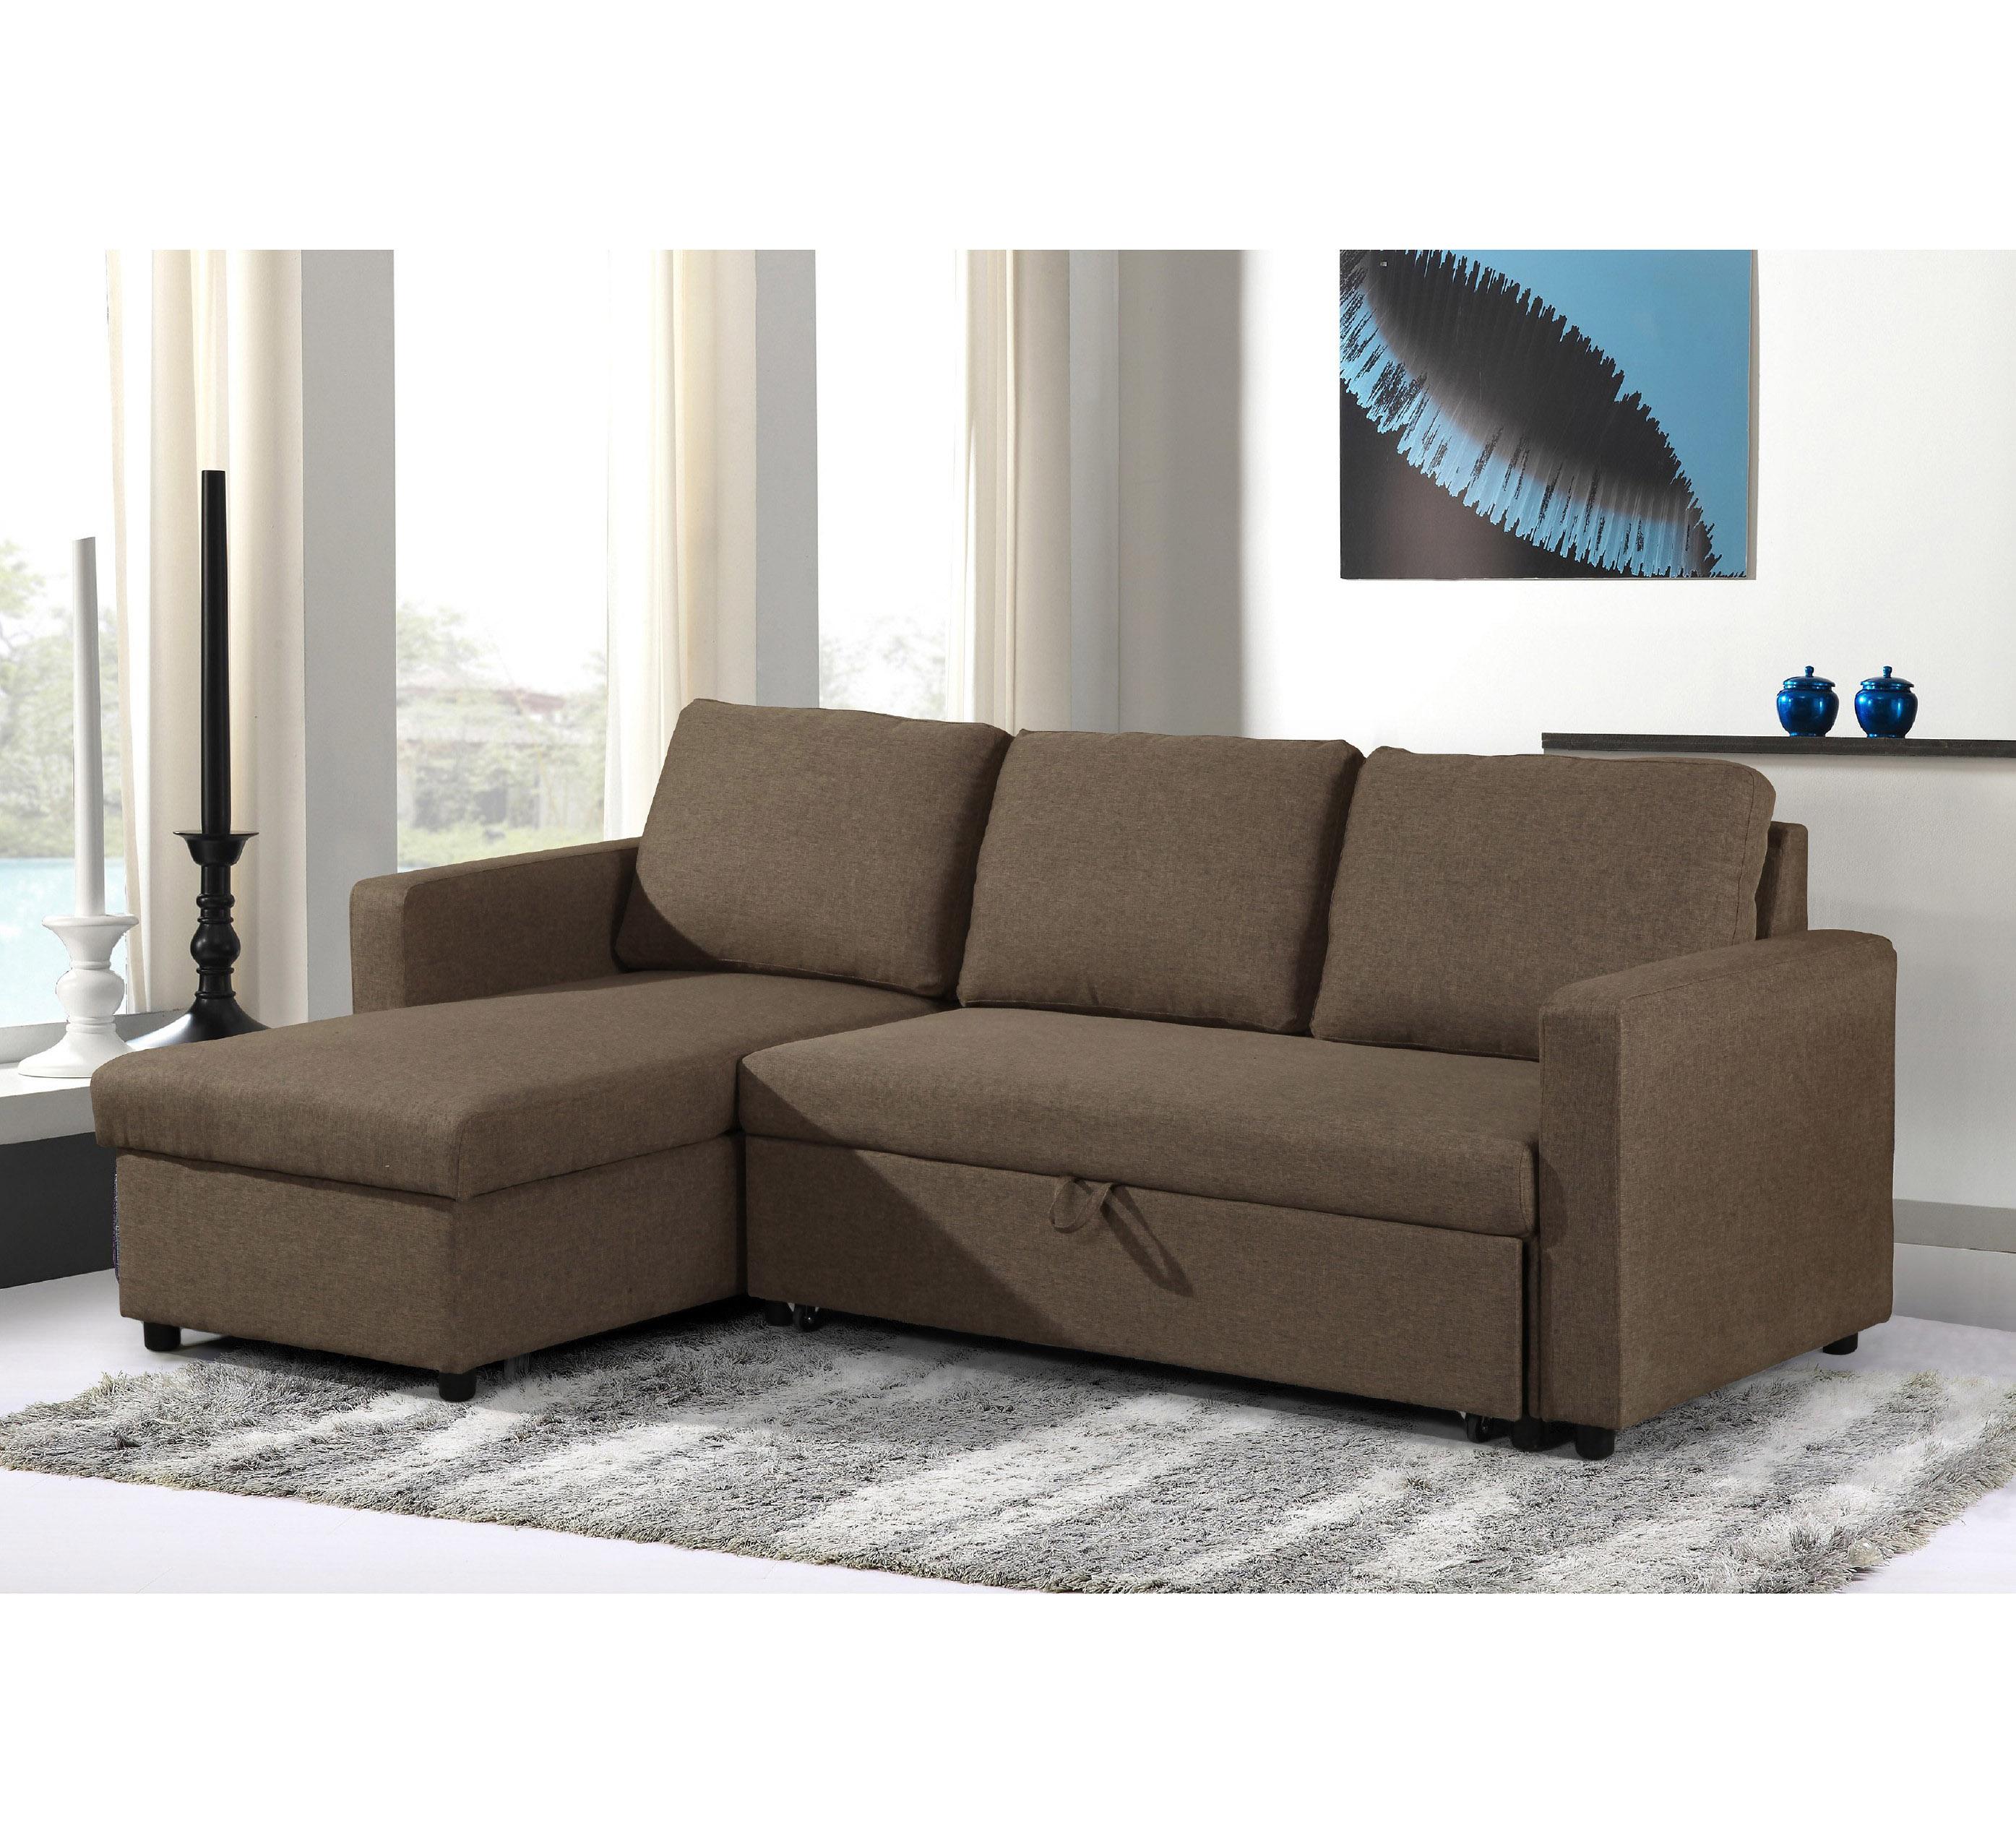 Modern Furniture Corner Sofa Bed Set